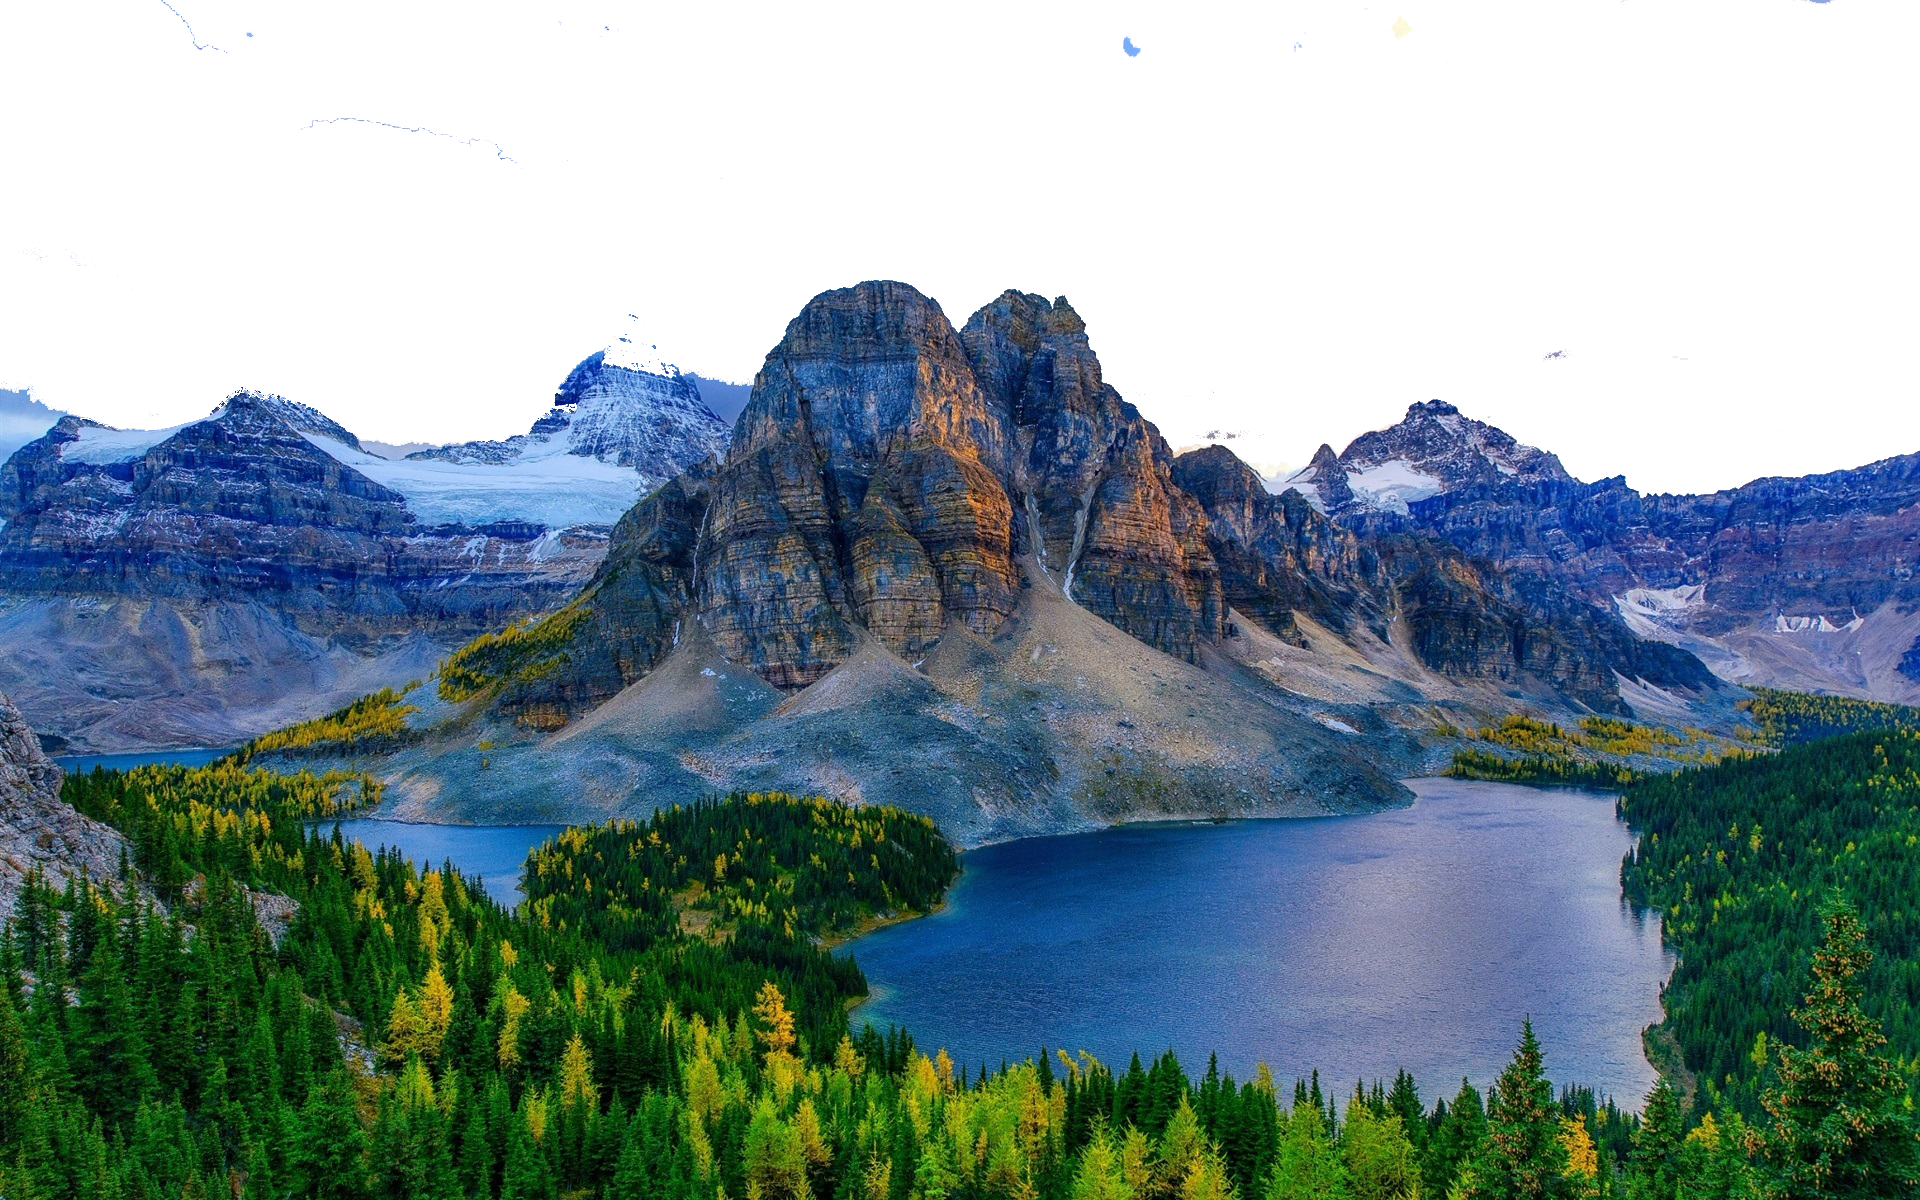 Landscape - Canada PNG Image